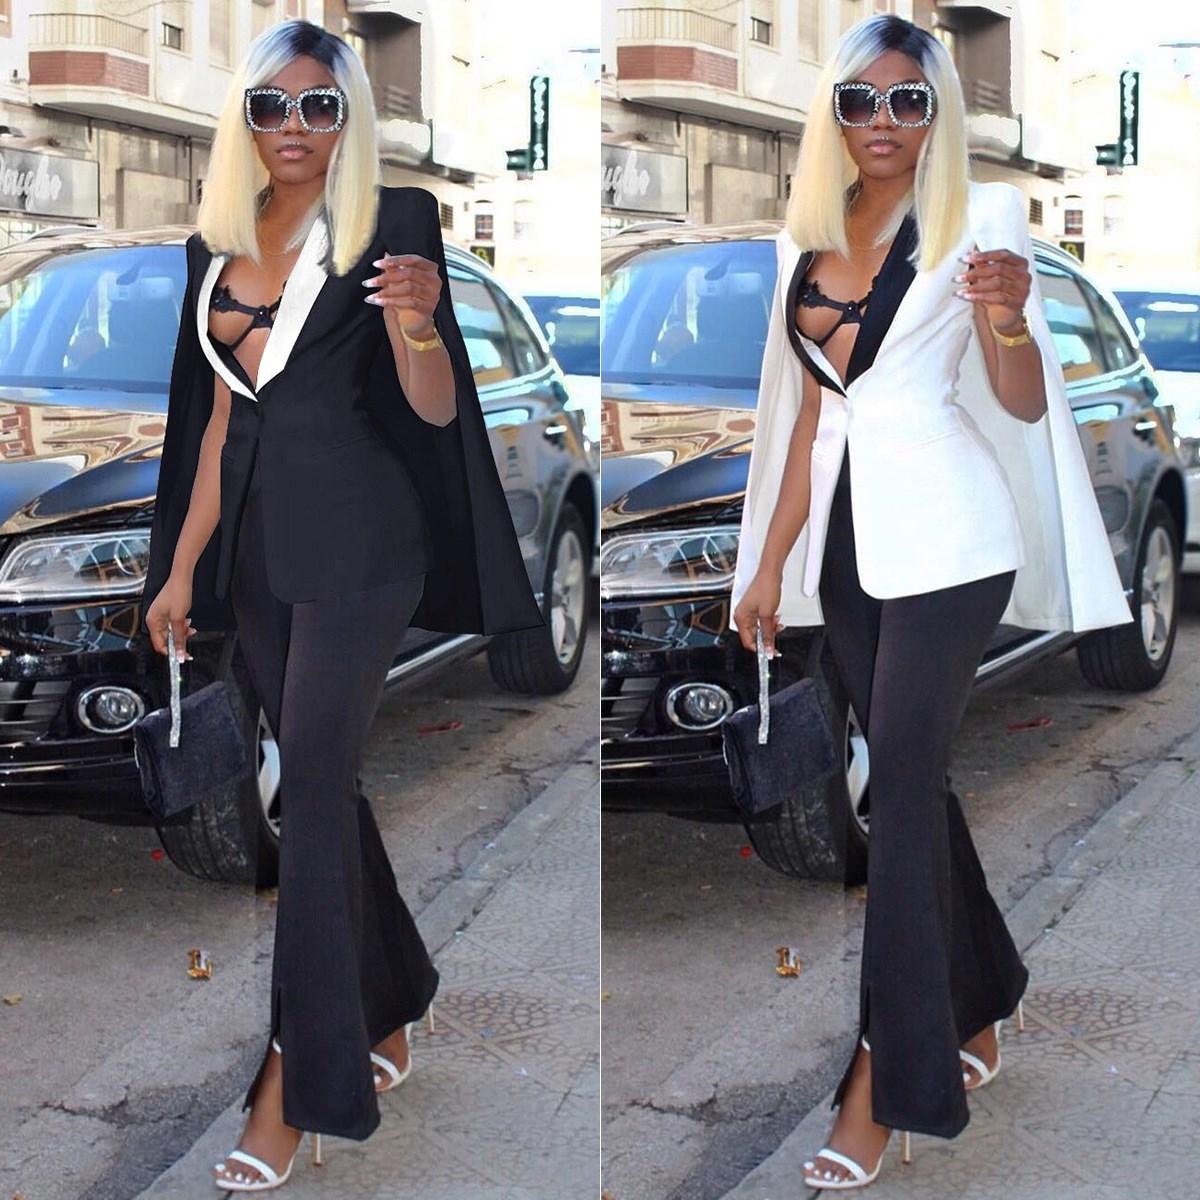 Suits & Sets Women's Clothing Sexy Deep V-neck Womens Poncho Cape Cloak Coat Blazer Suit Shawl Slim Fit Outwear